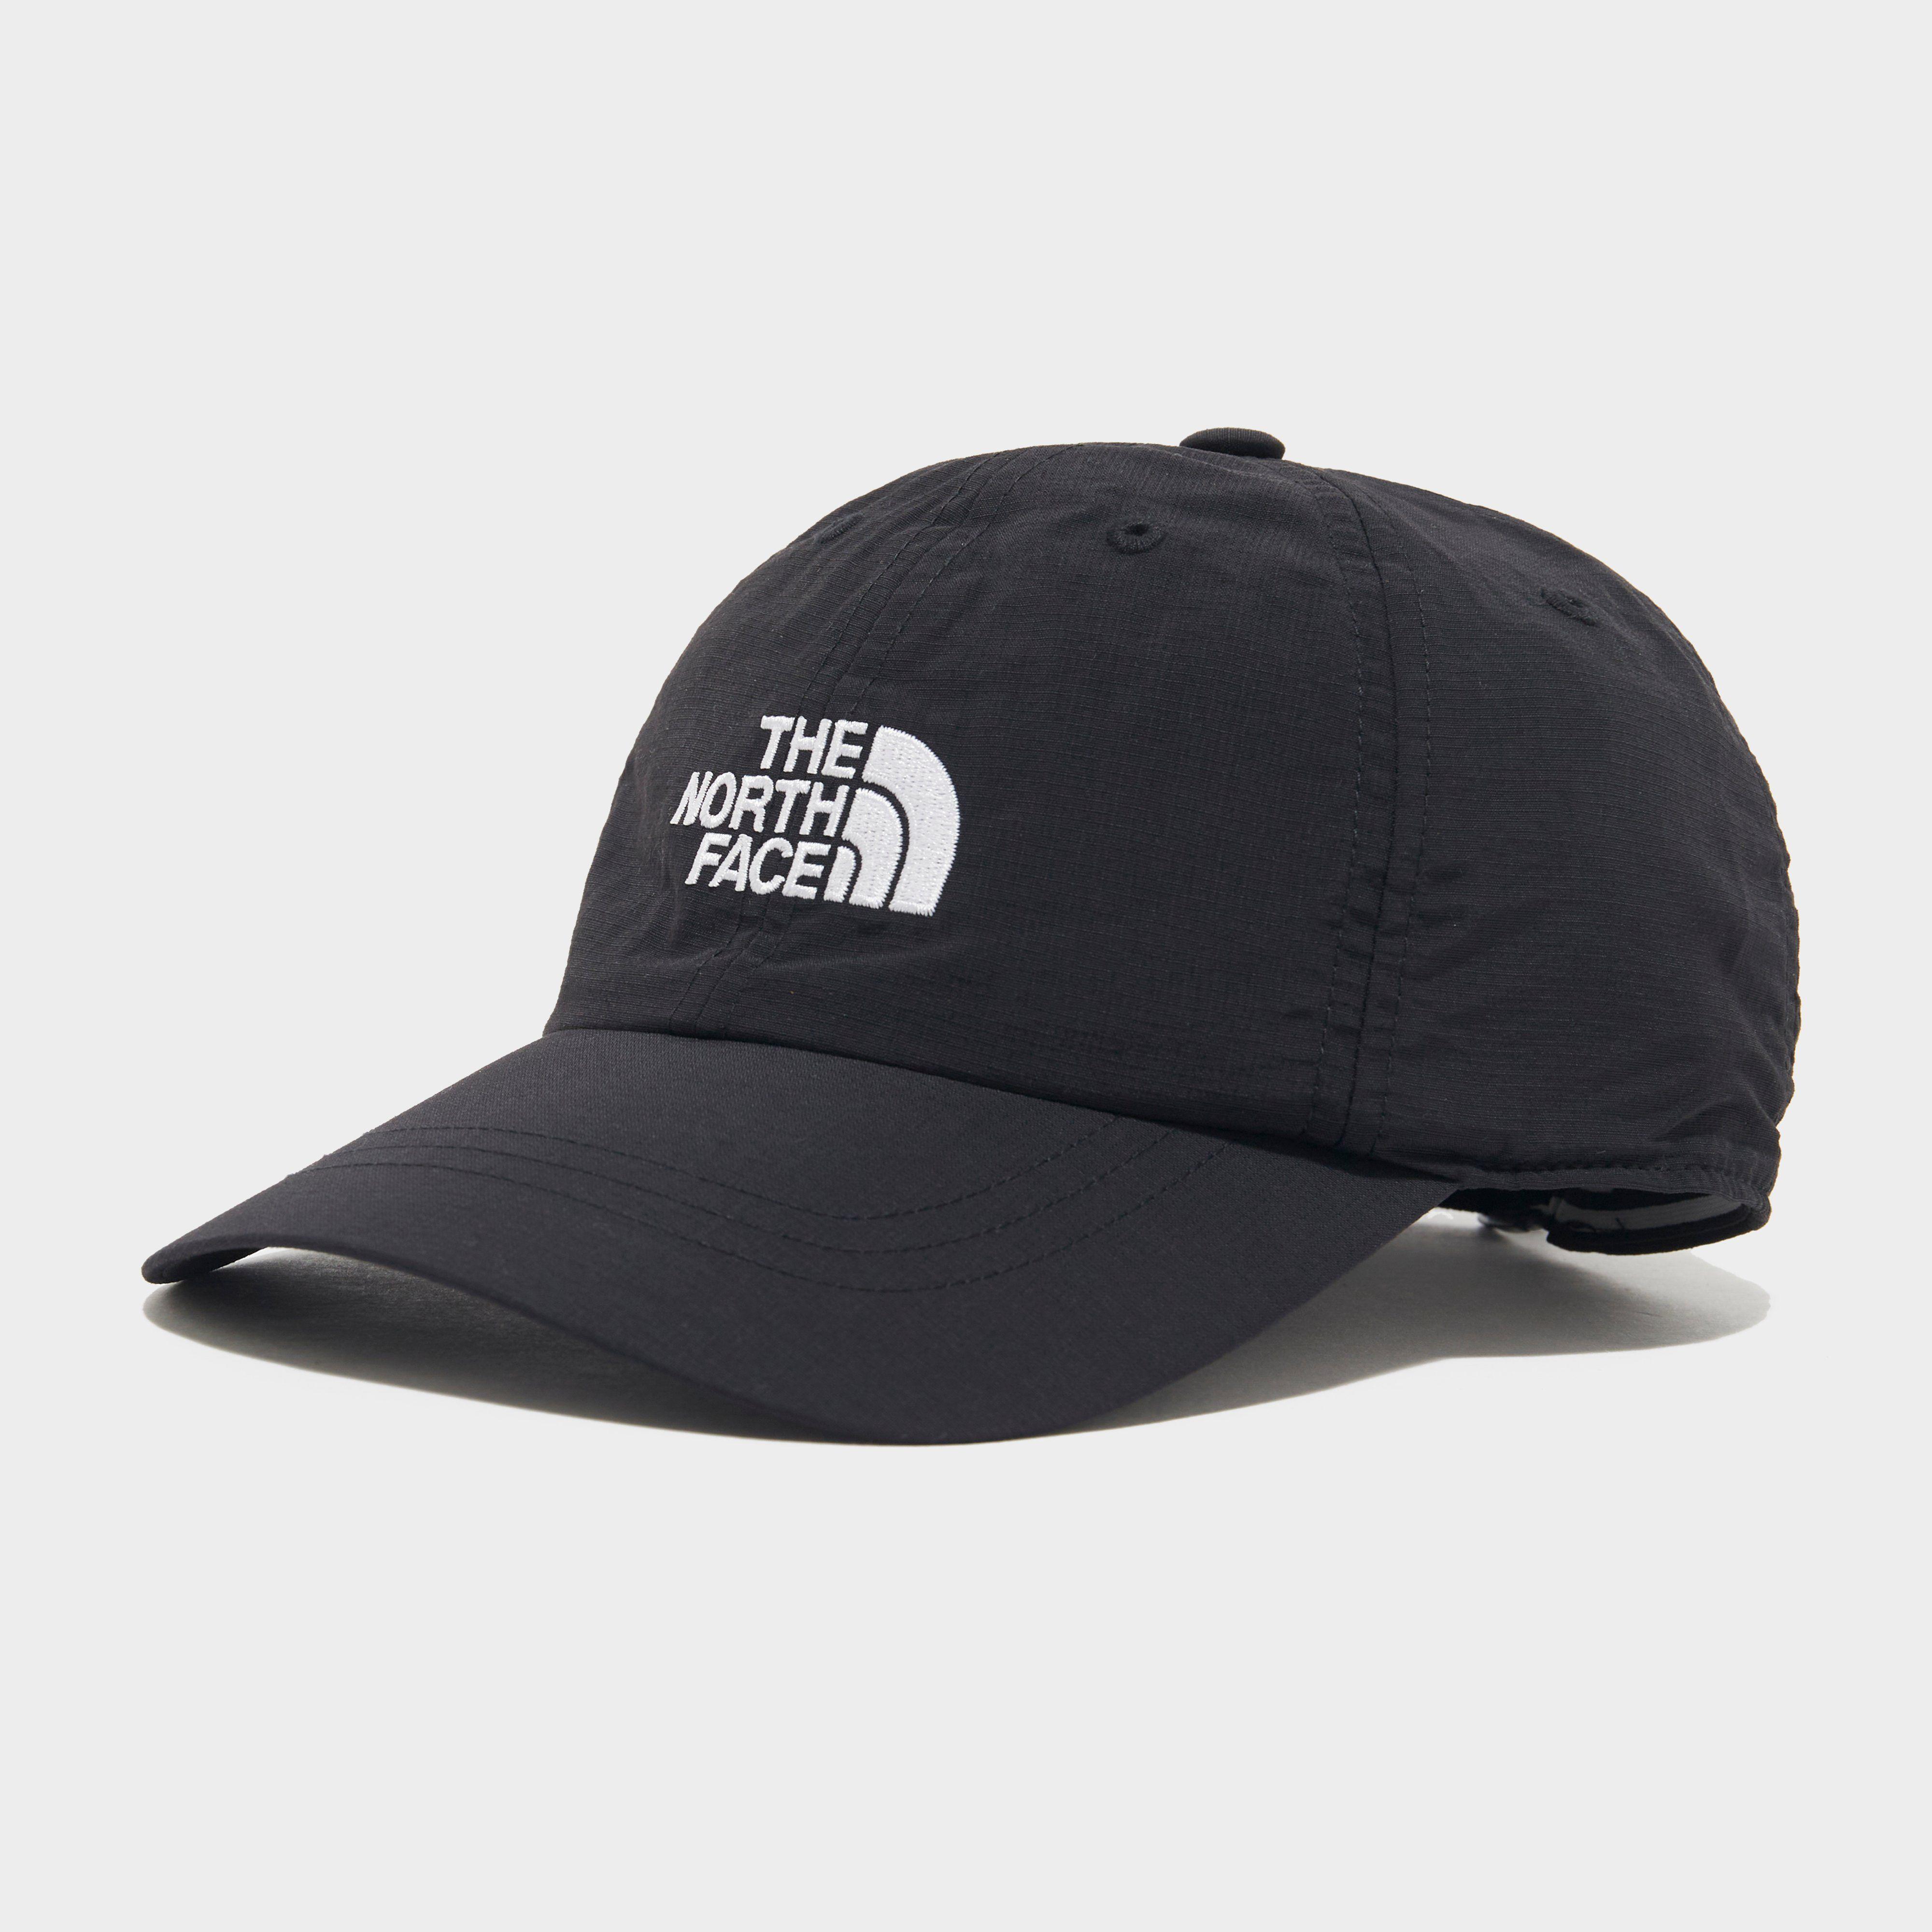 THE NORTH FACE Men's Horizon Strapback Cap